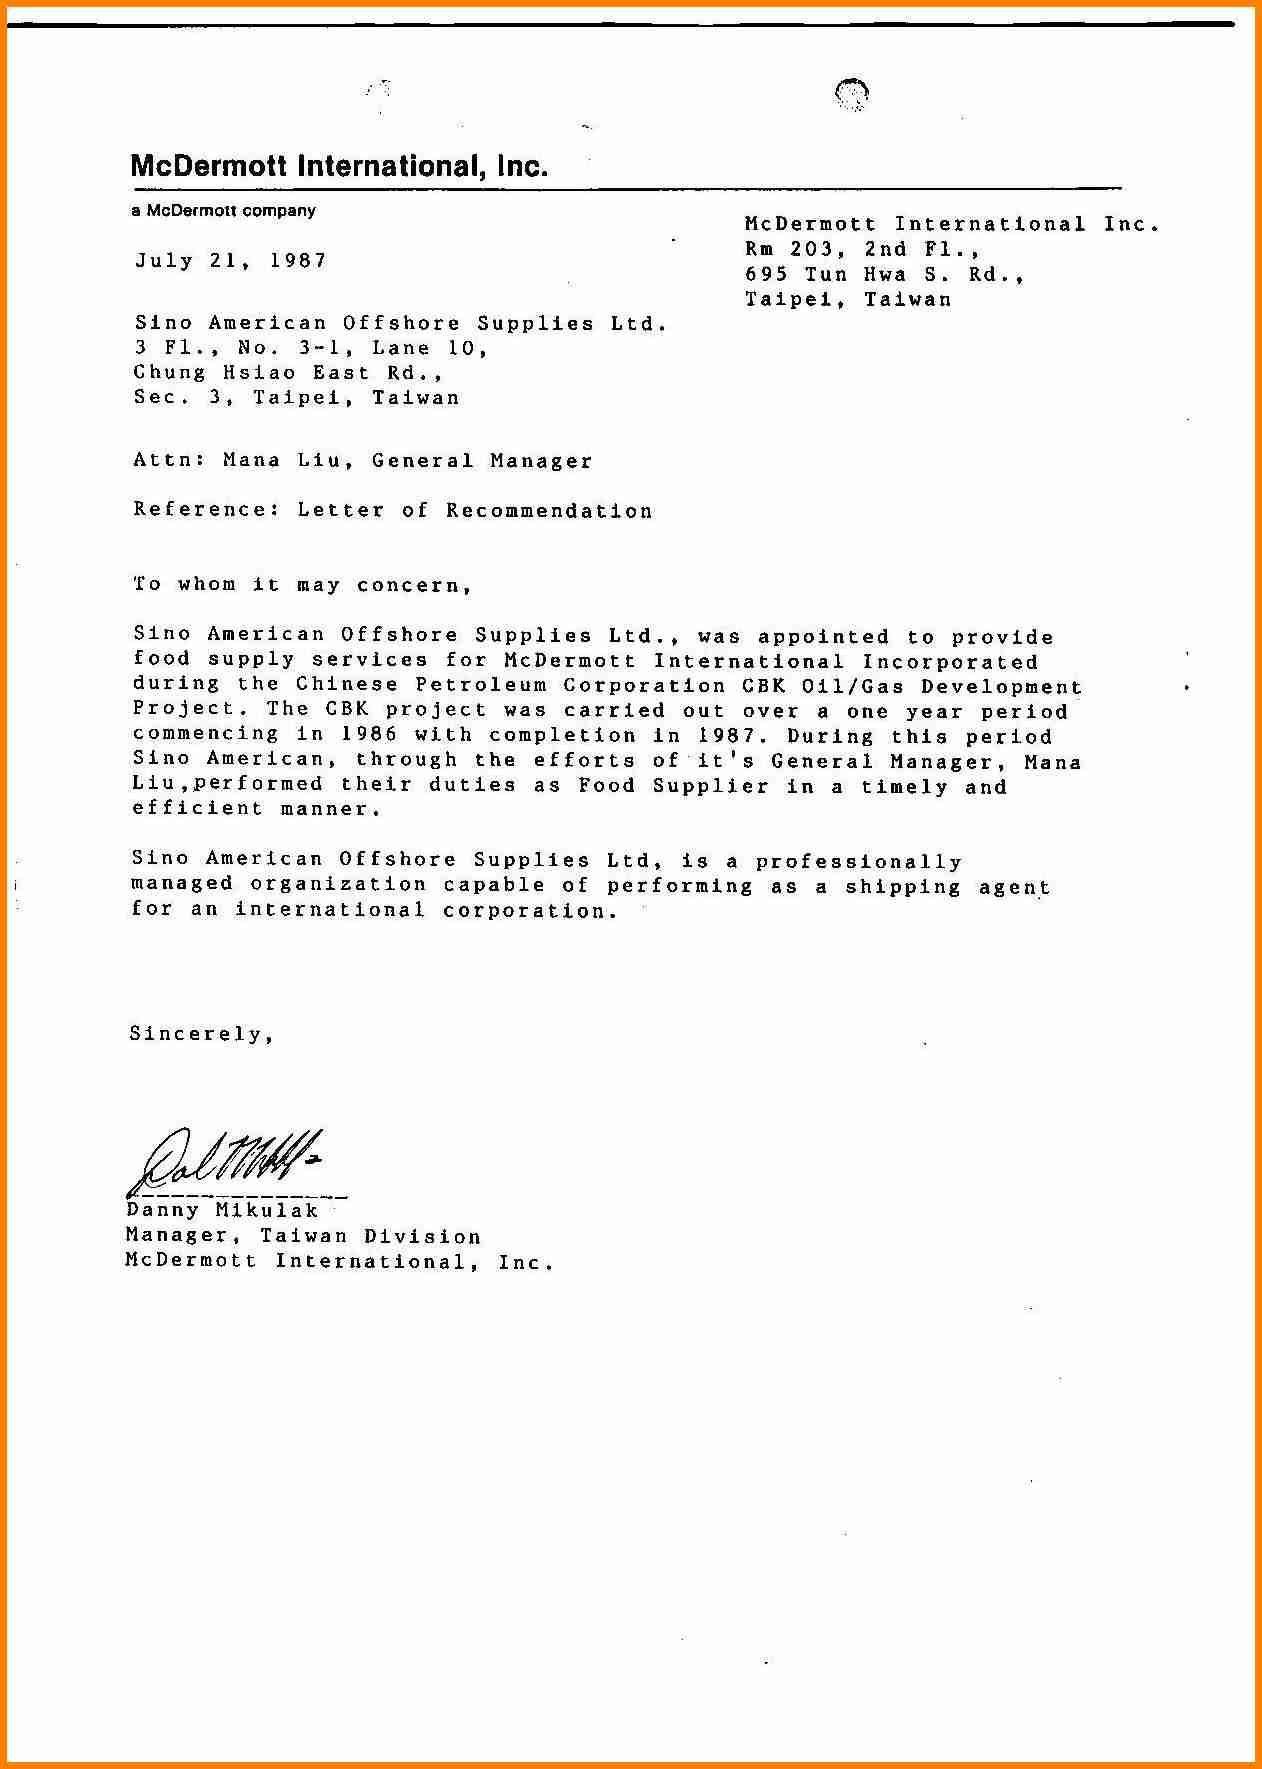 Fresh General Letter Of Recommendation Sample Download Https Letterbuis Com Fresh General Letter Of Recom Letter Of Recommendation Reference Letter Lettering General letter of recommendation template